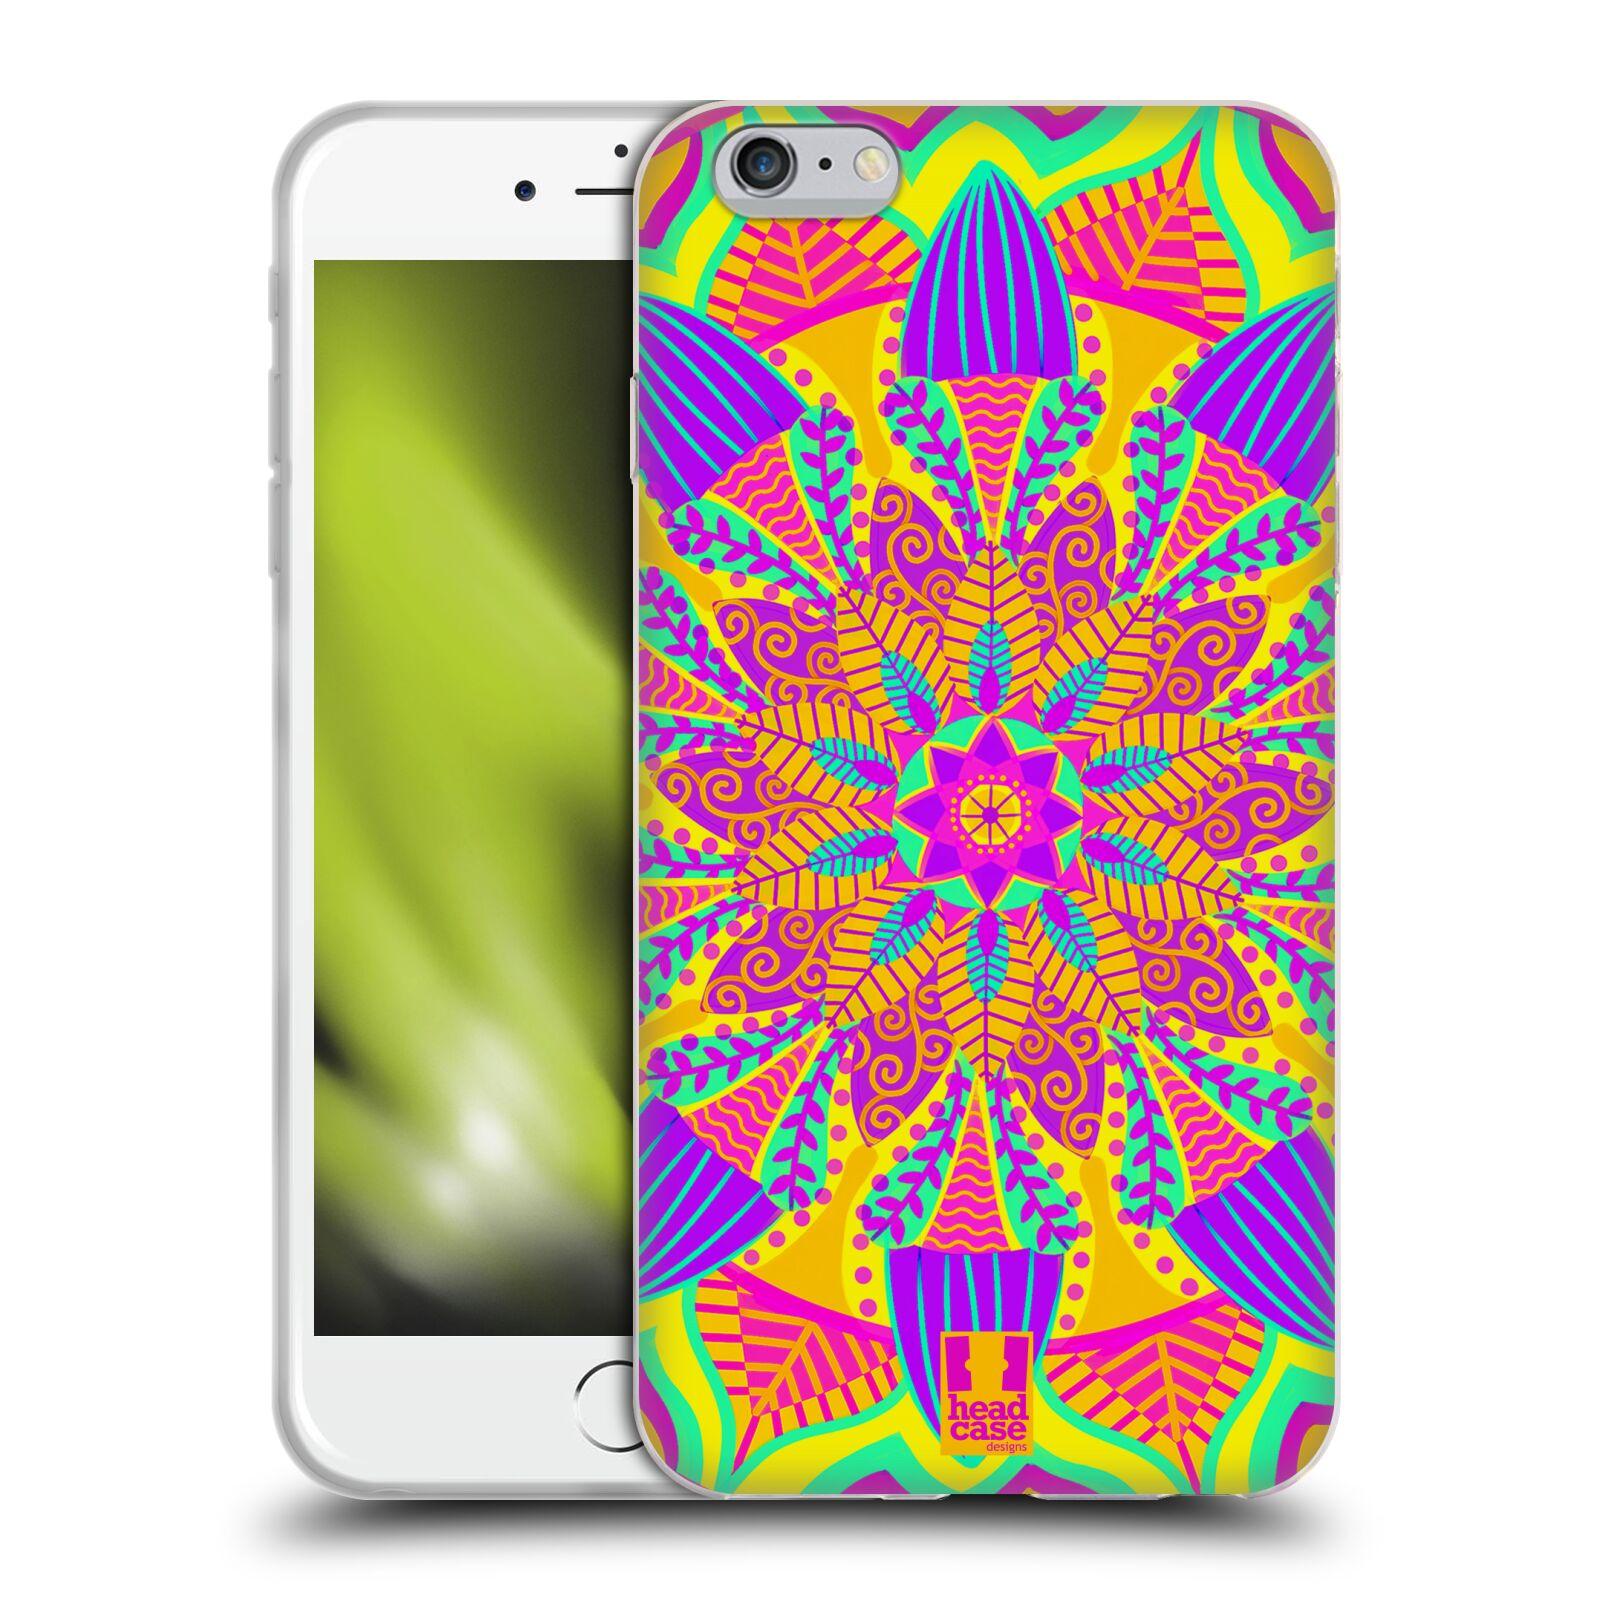 HEAD CASE silikonový obal na mobil Apple Iphone 6 PLUS/ 6S PLUS vzor Indie Mandala květinový motiv VÝCHOD SLUNCE LIMETKOVÁ